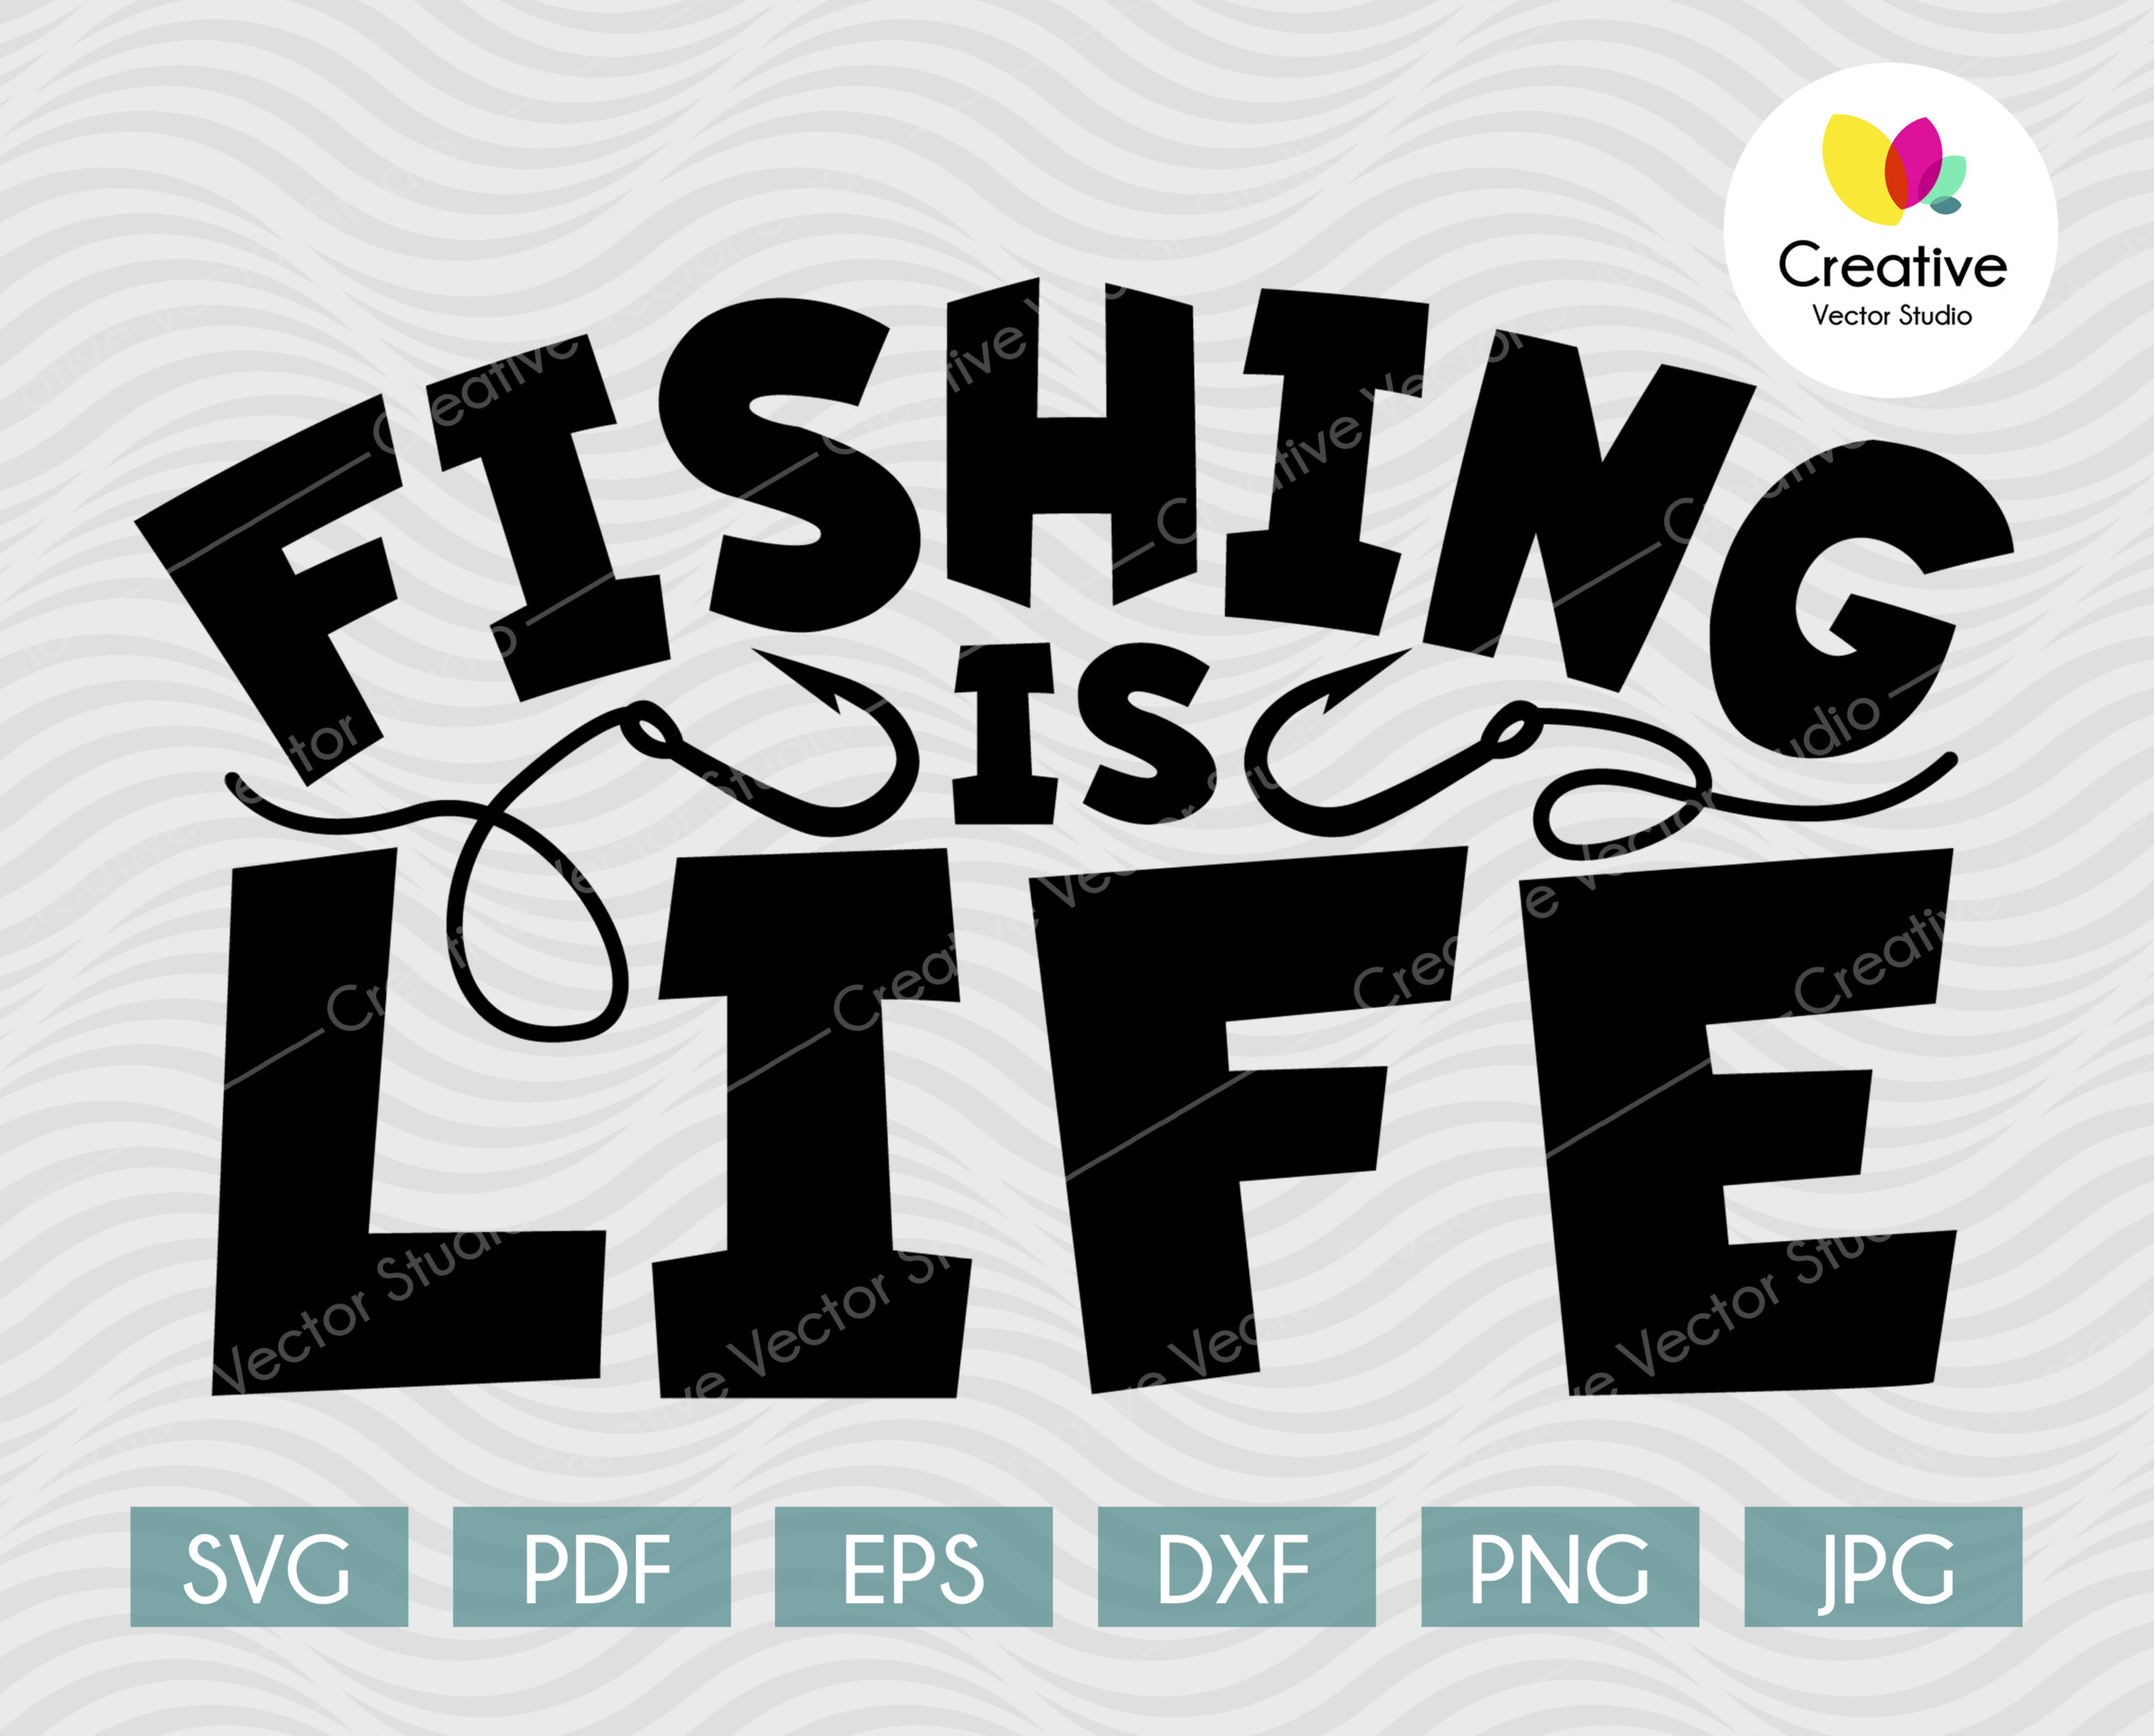 Download Fishing Is Life Svg Cut File Image Creative Vector Studio